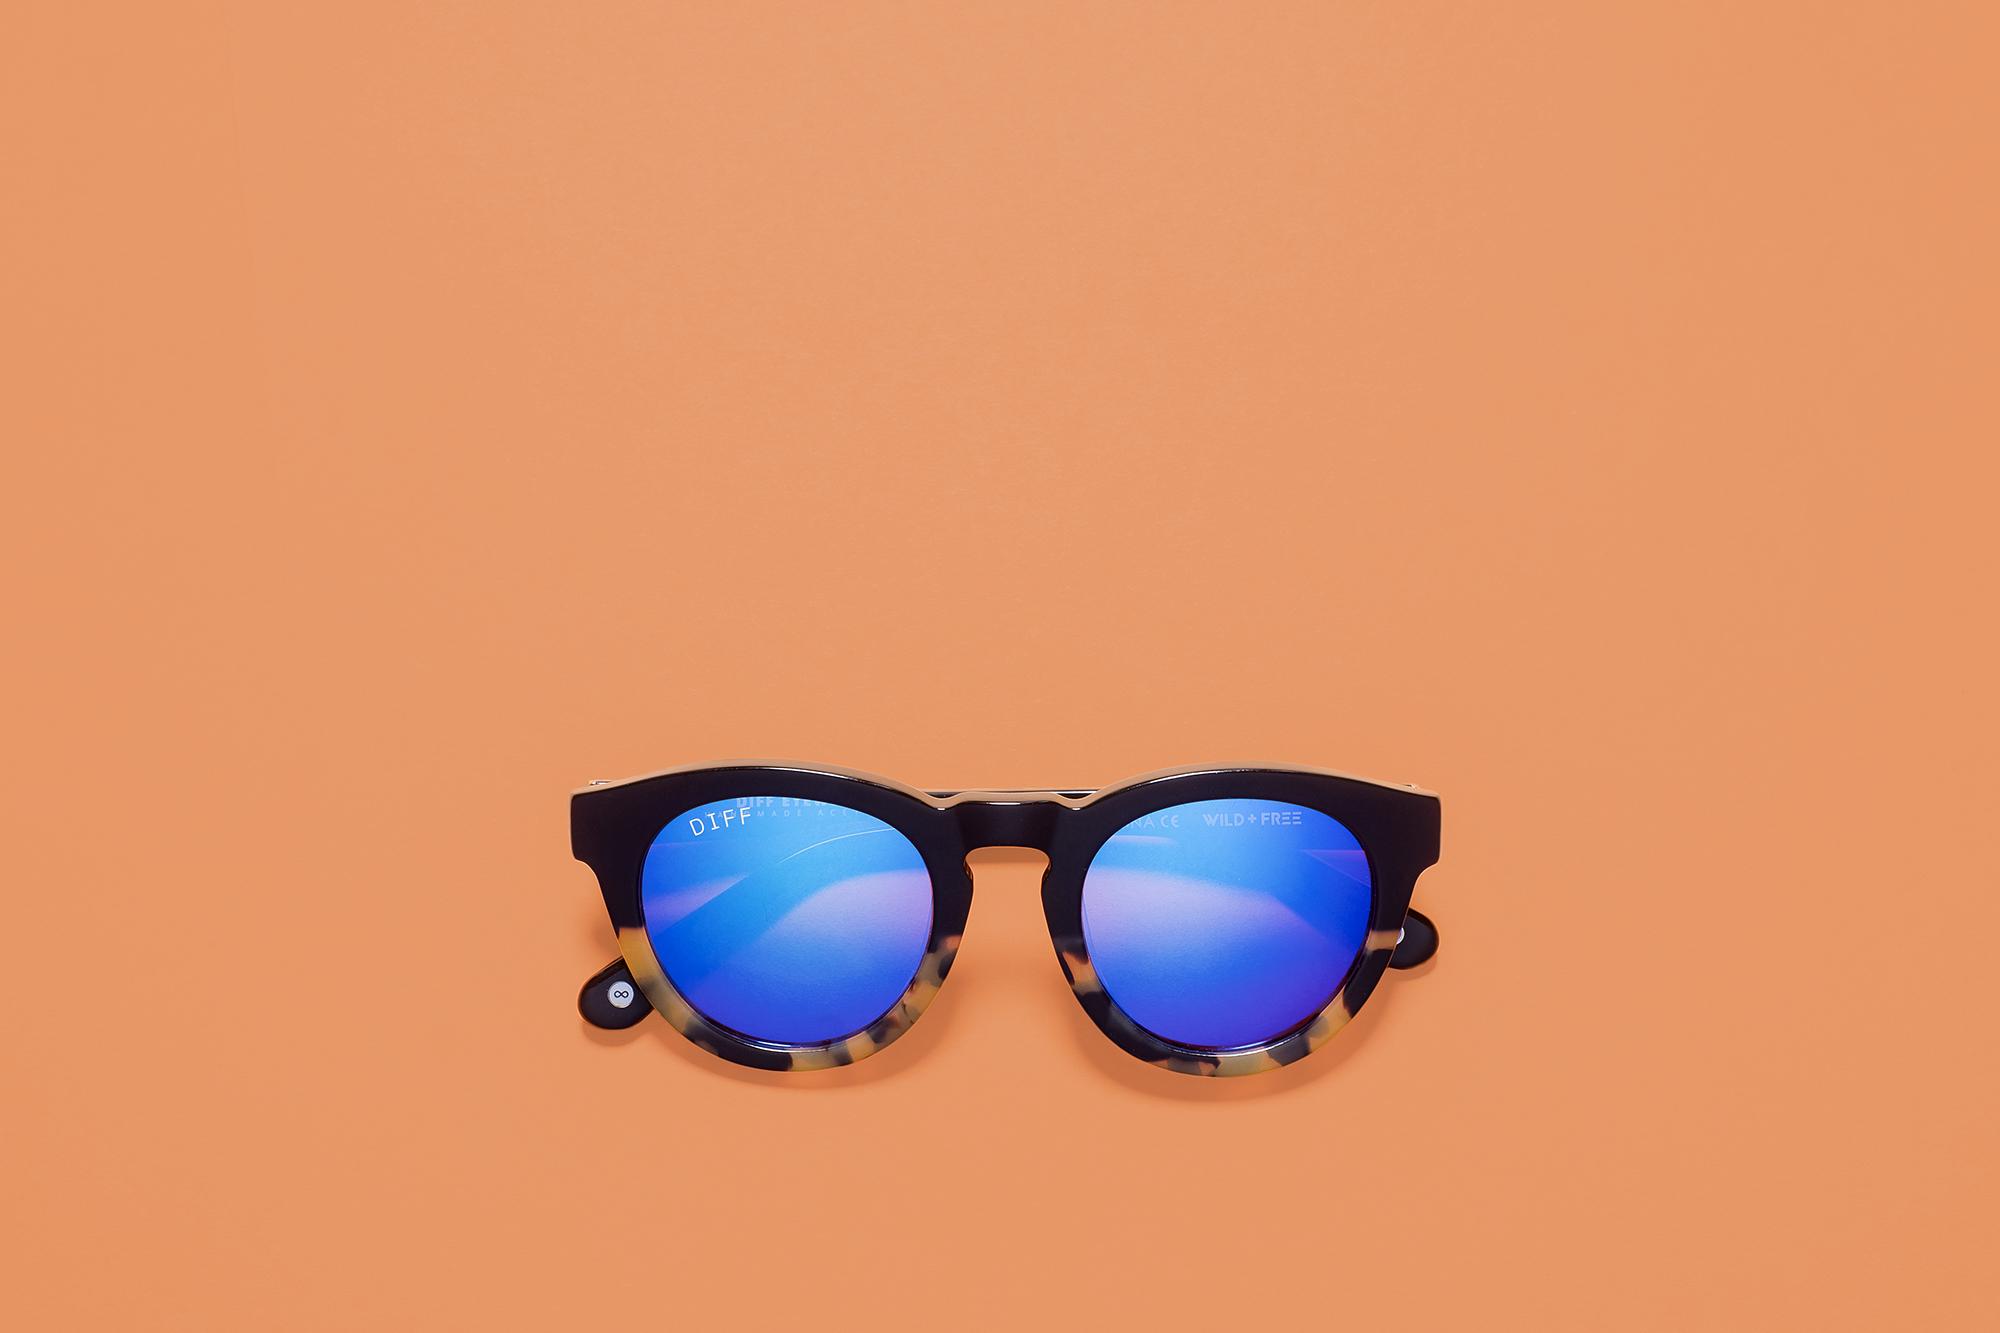 Diff_Sunglasses_Advertising_Photography_Blue_Orange_George_Fairbairn_Photographer.jpg